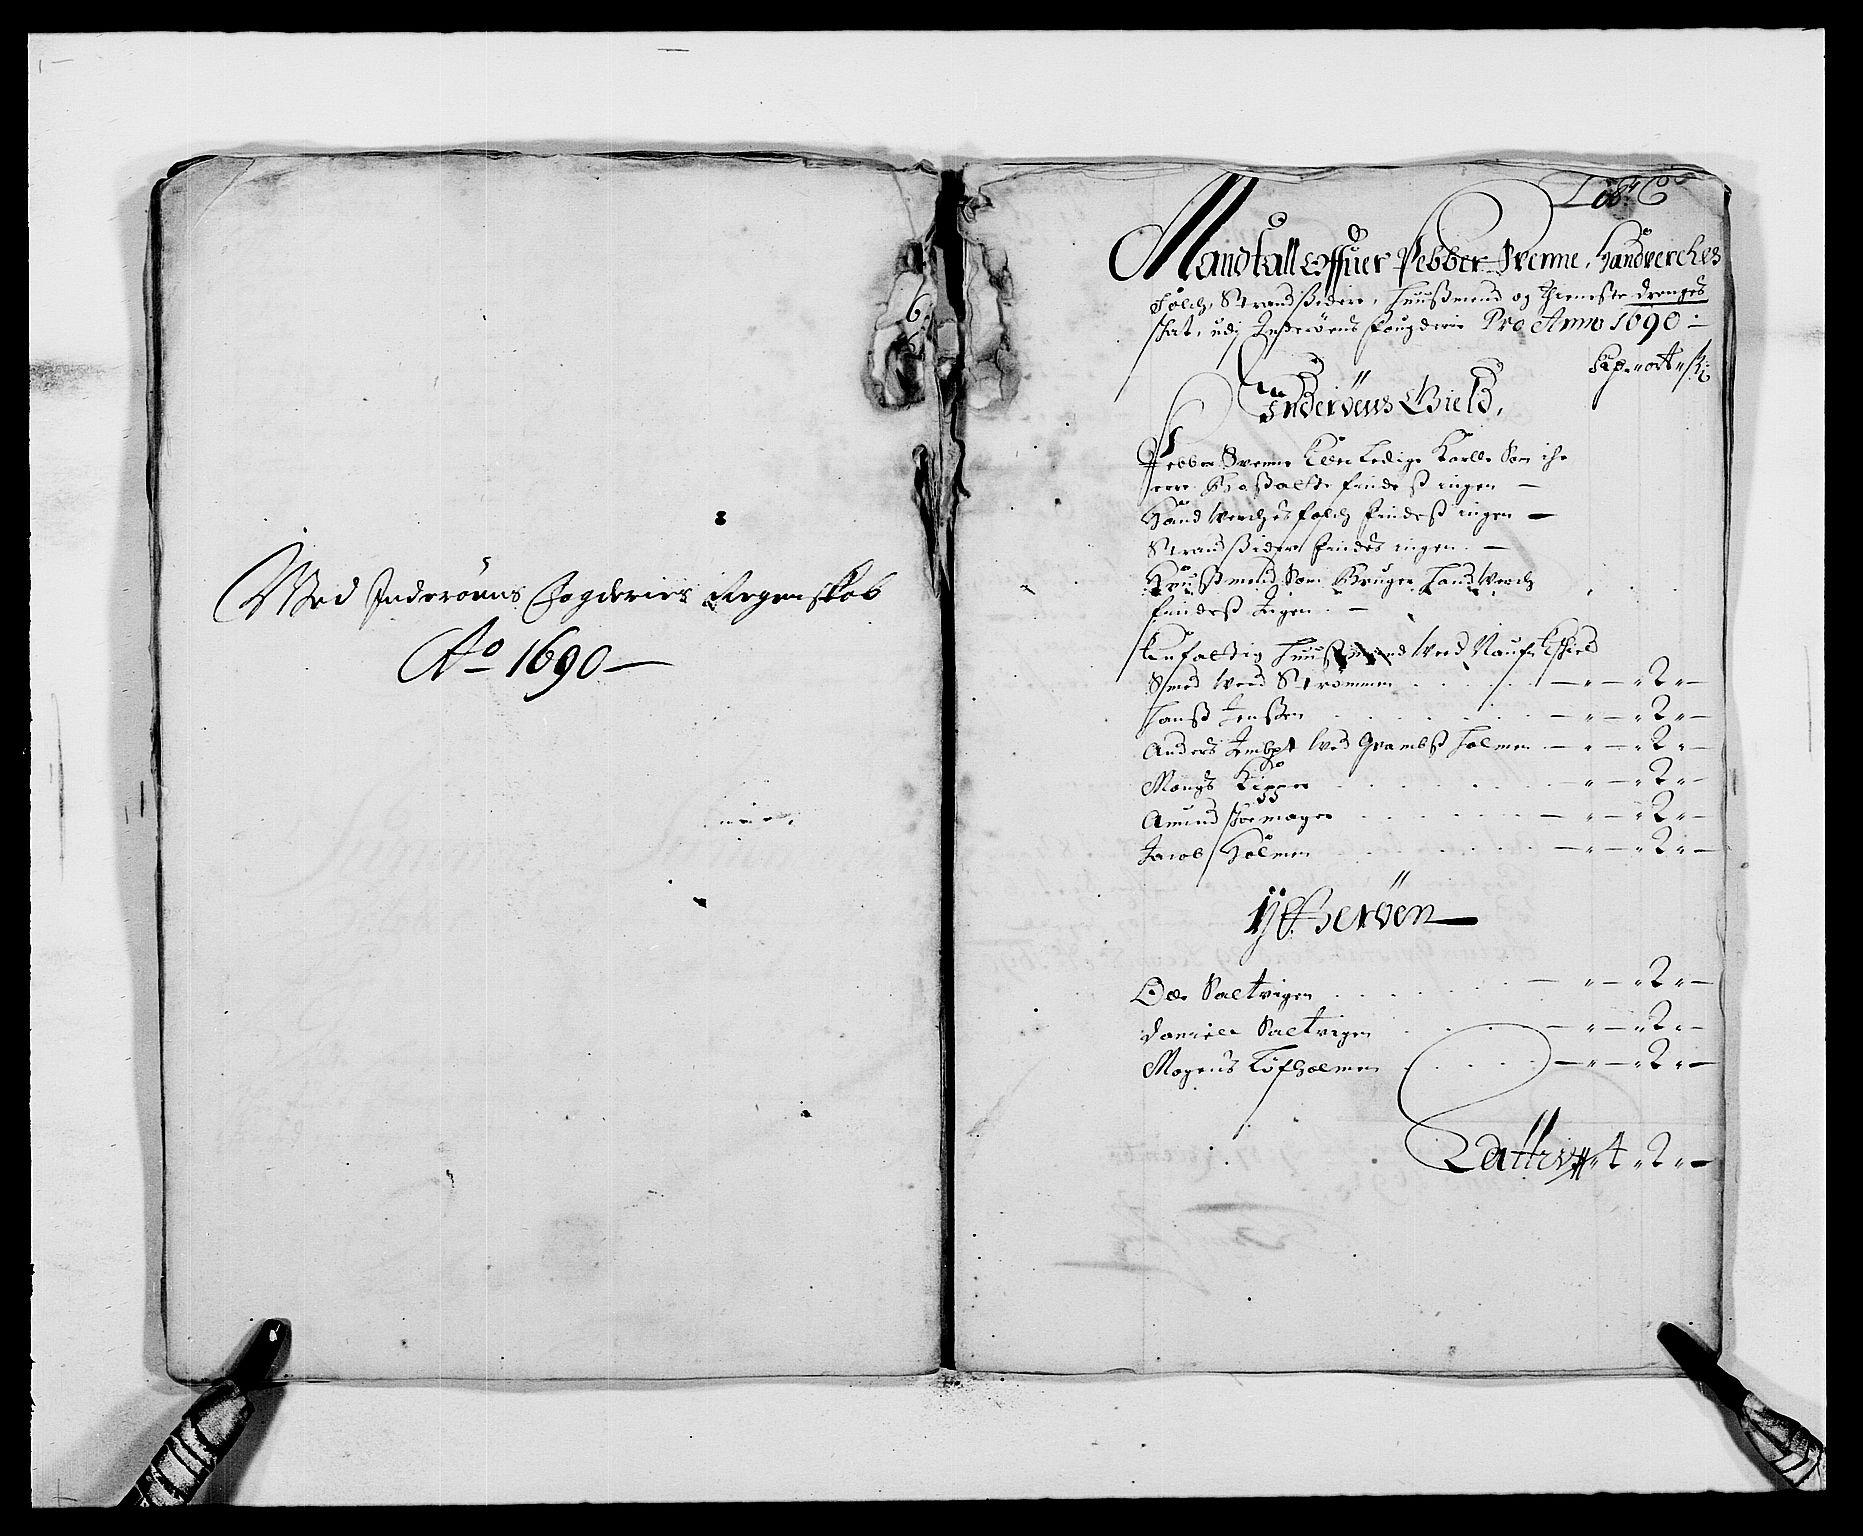 RA, Rentekammeret inntil 1814, Reviderte regnskaper, Fogderegnskap, R63/L4307: Fogderegnskap Inderøy, 1690-1691, s. 80